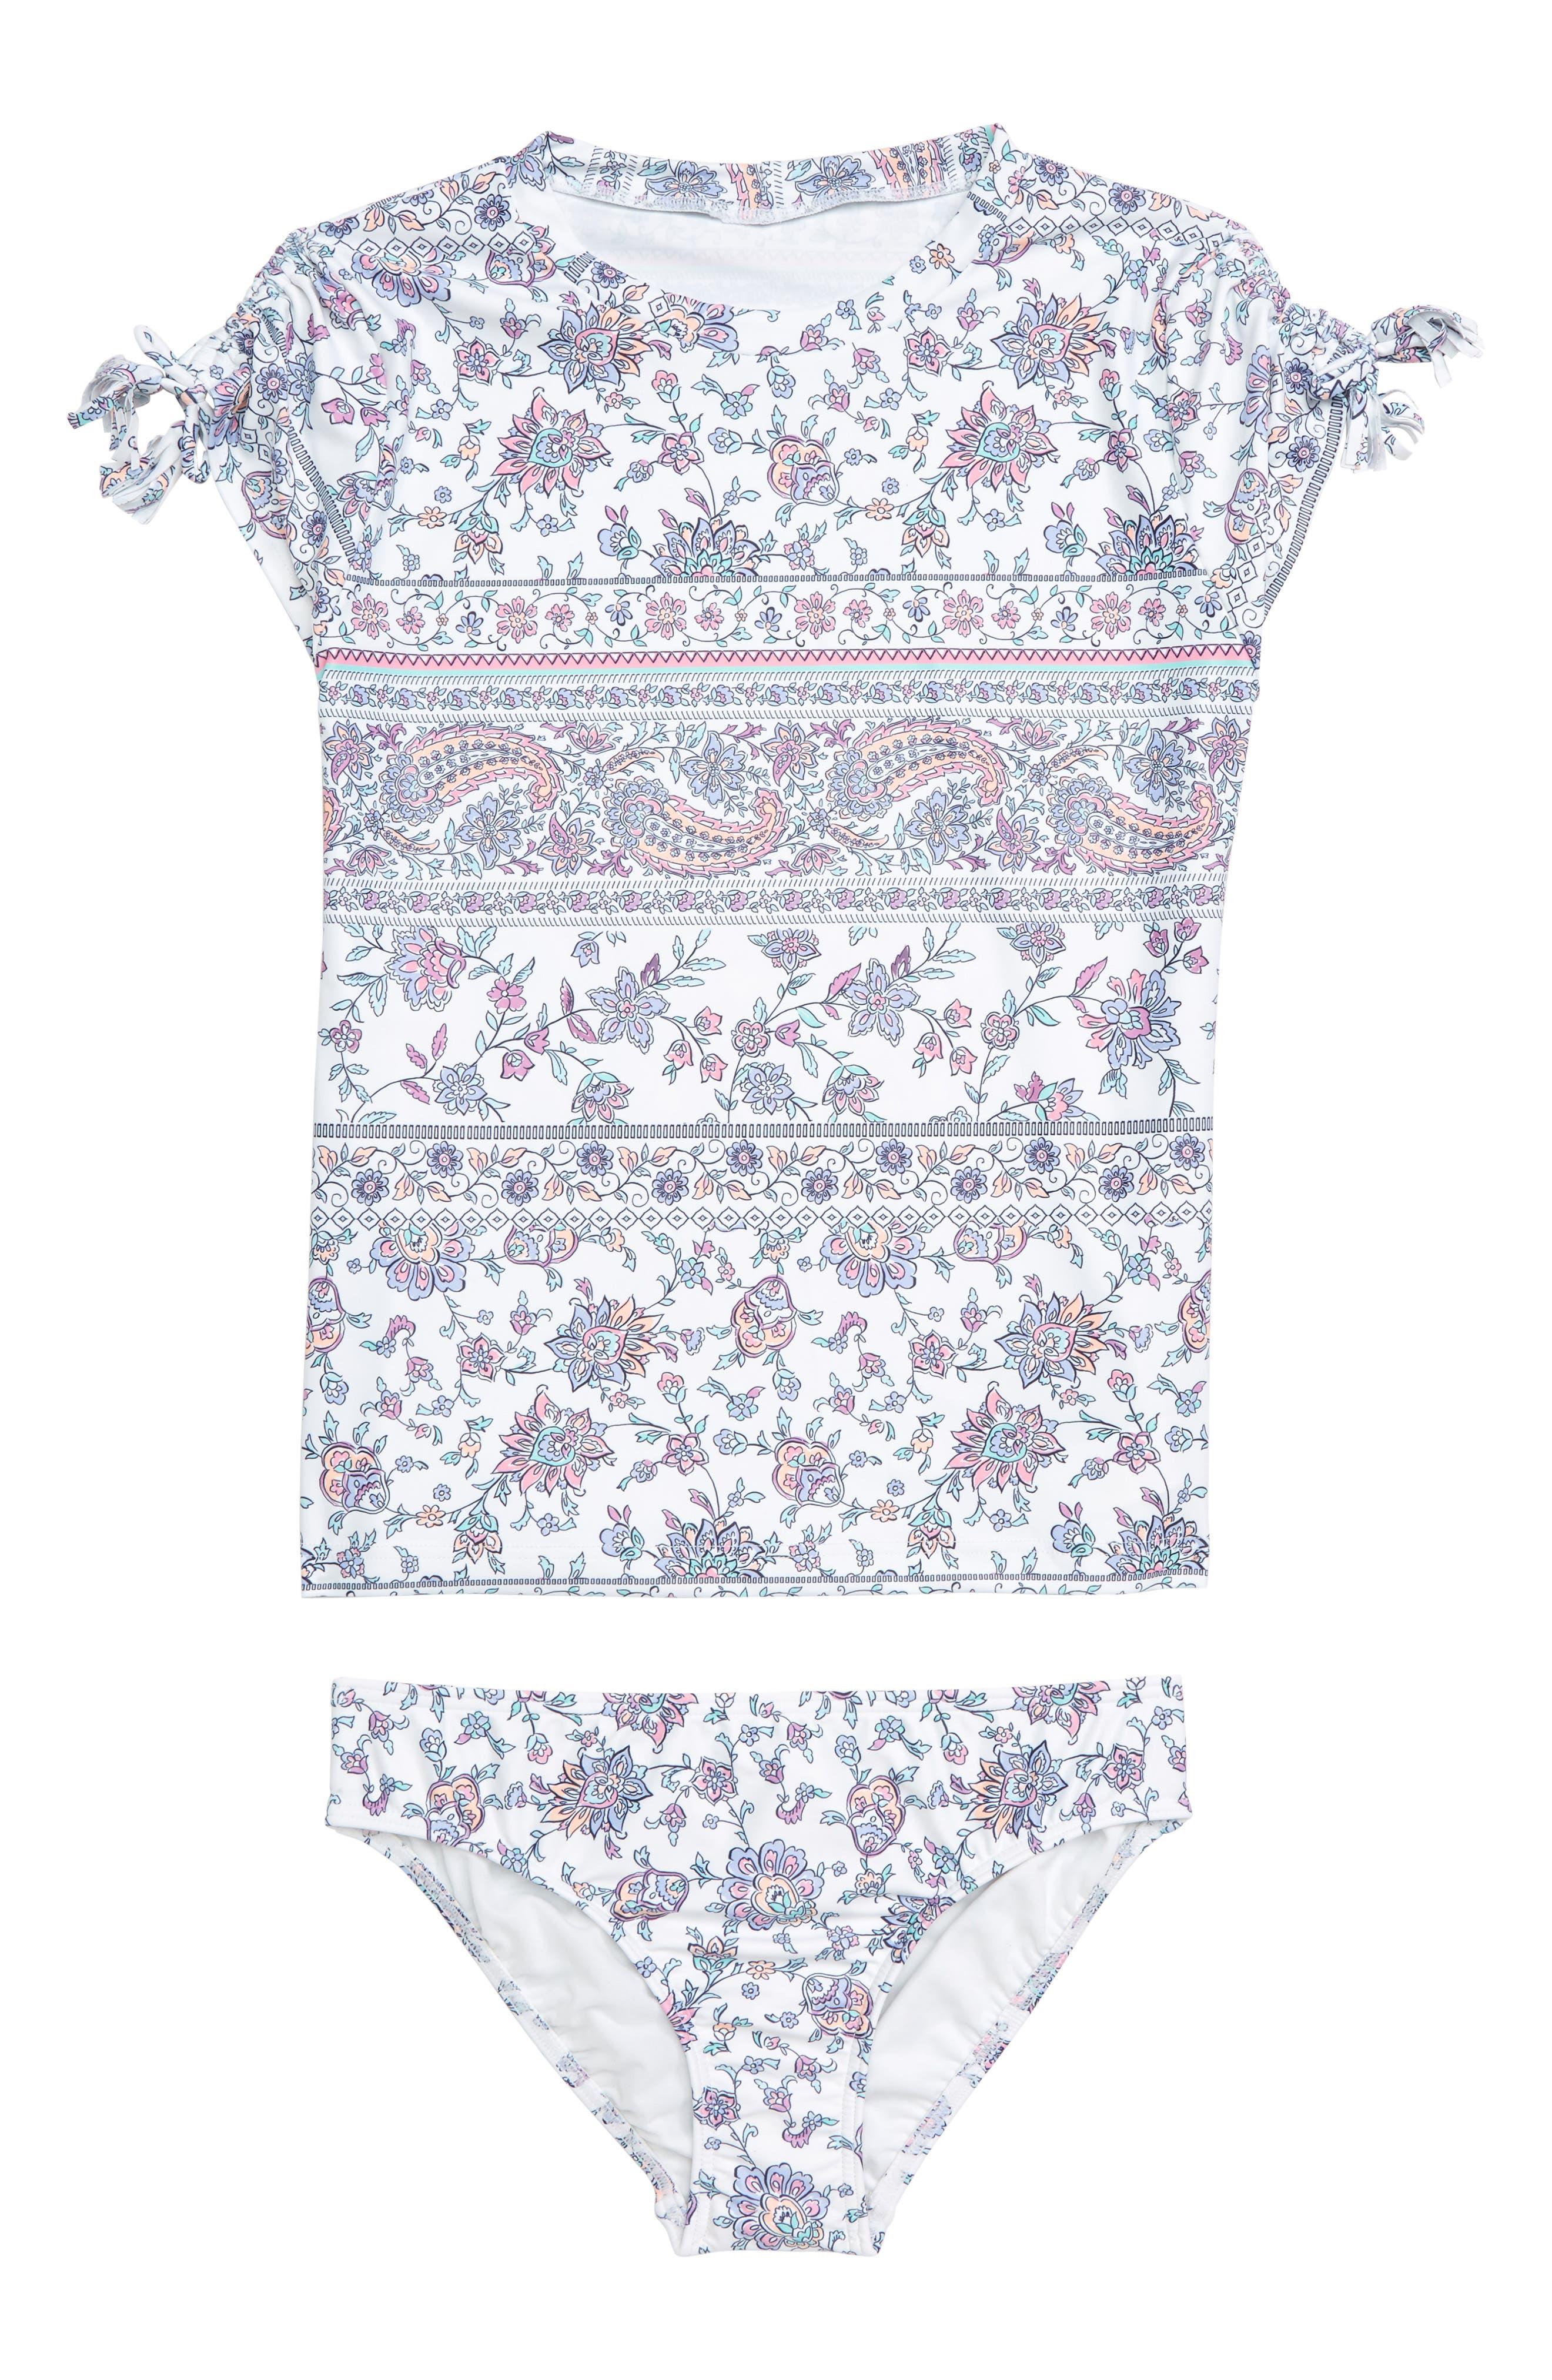 Girls Seafolly Pop Palace Surf TwoPiece Rashguard Swimsuit Size 12  White